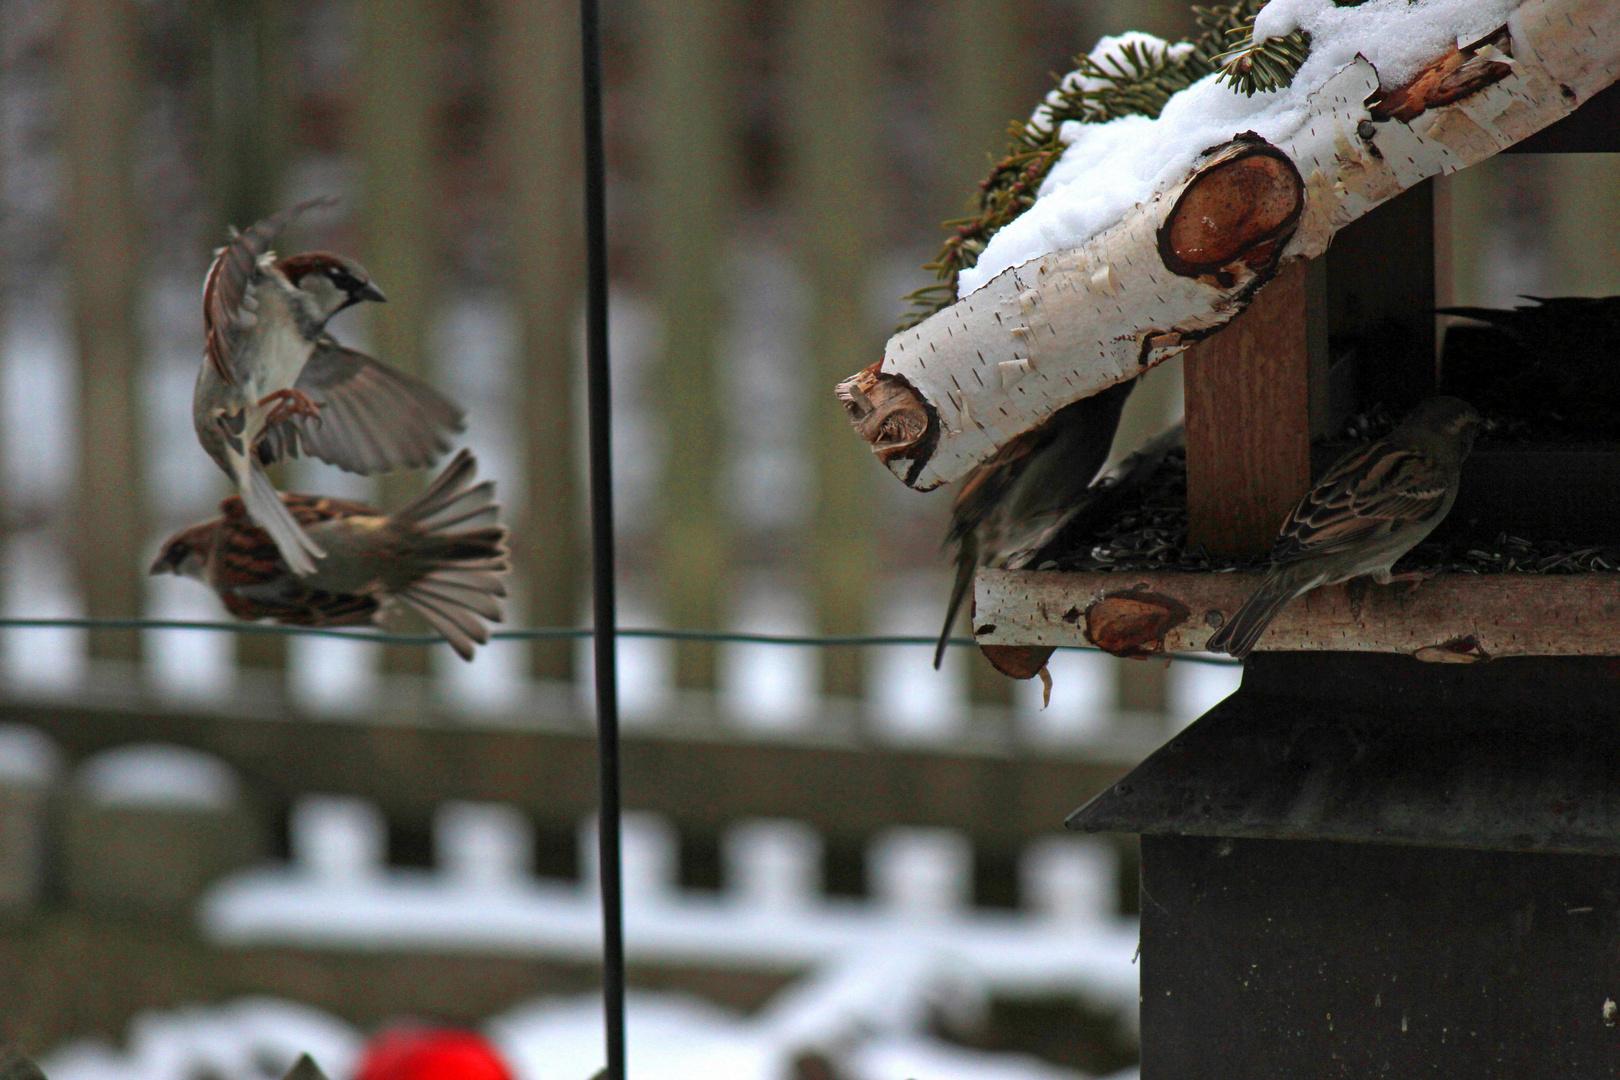 Vogel im Anflug (Versuch1)